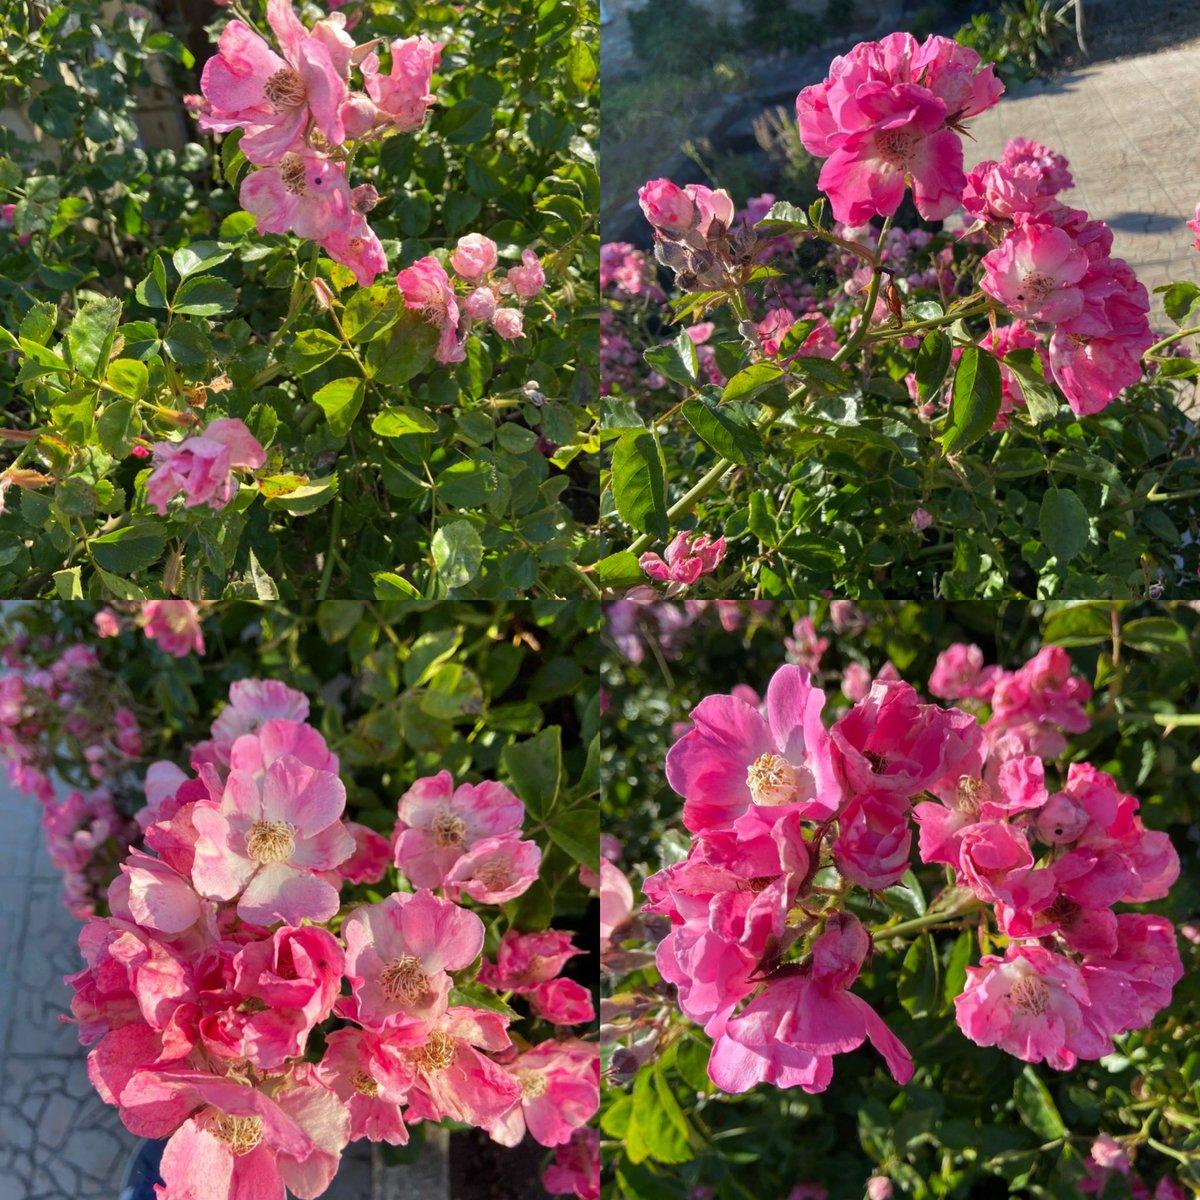 Notre jardin plein de roses! C'est enivrant! Plein de dessins en perspective #mygarden #monjardin #jardin #garden #roses #rosas #flores #flowers #printemps #primavera #soleil #sun #bonheur #felicidad #hapinesspic.twitter.com/Kzjn8xJ41f